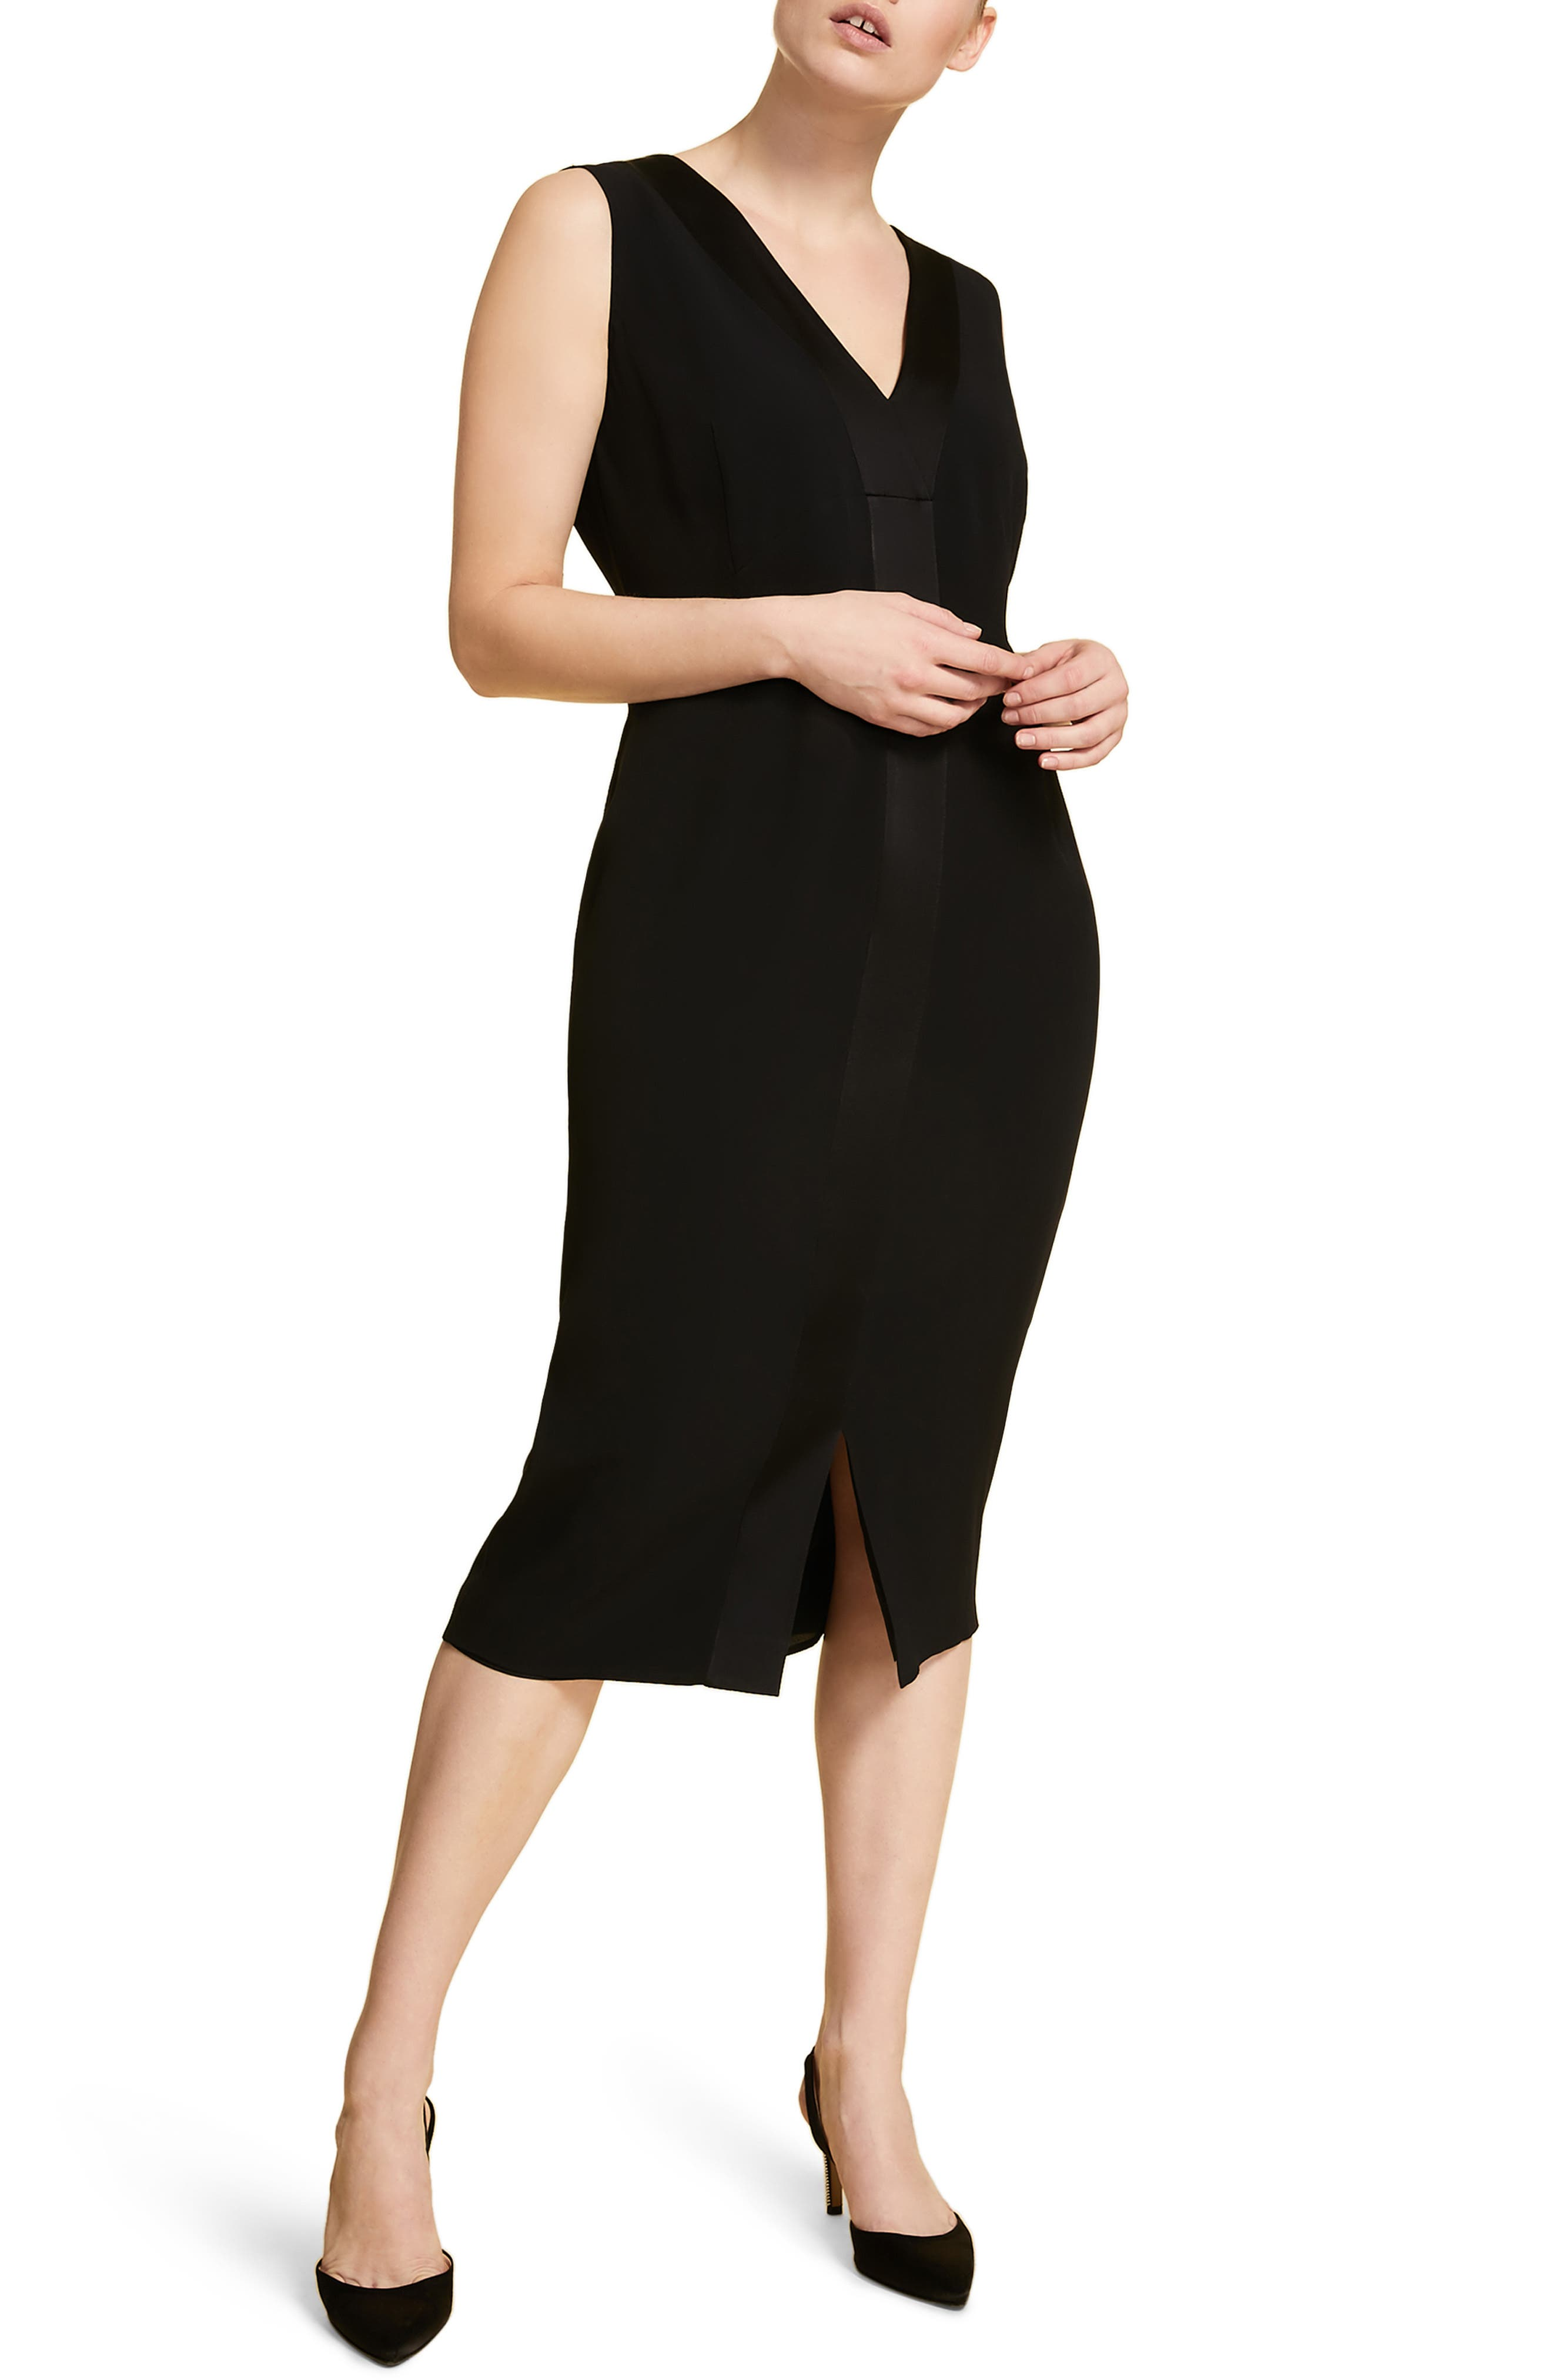 Plus Size Marina Rinaldi Dioniso Cocktail Sheath Dress, Black